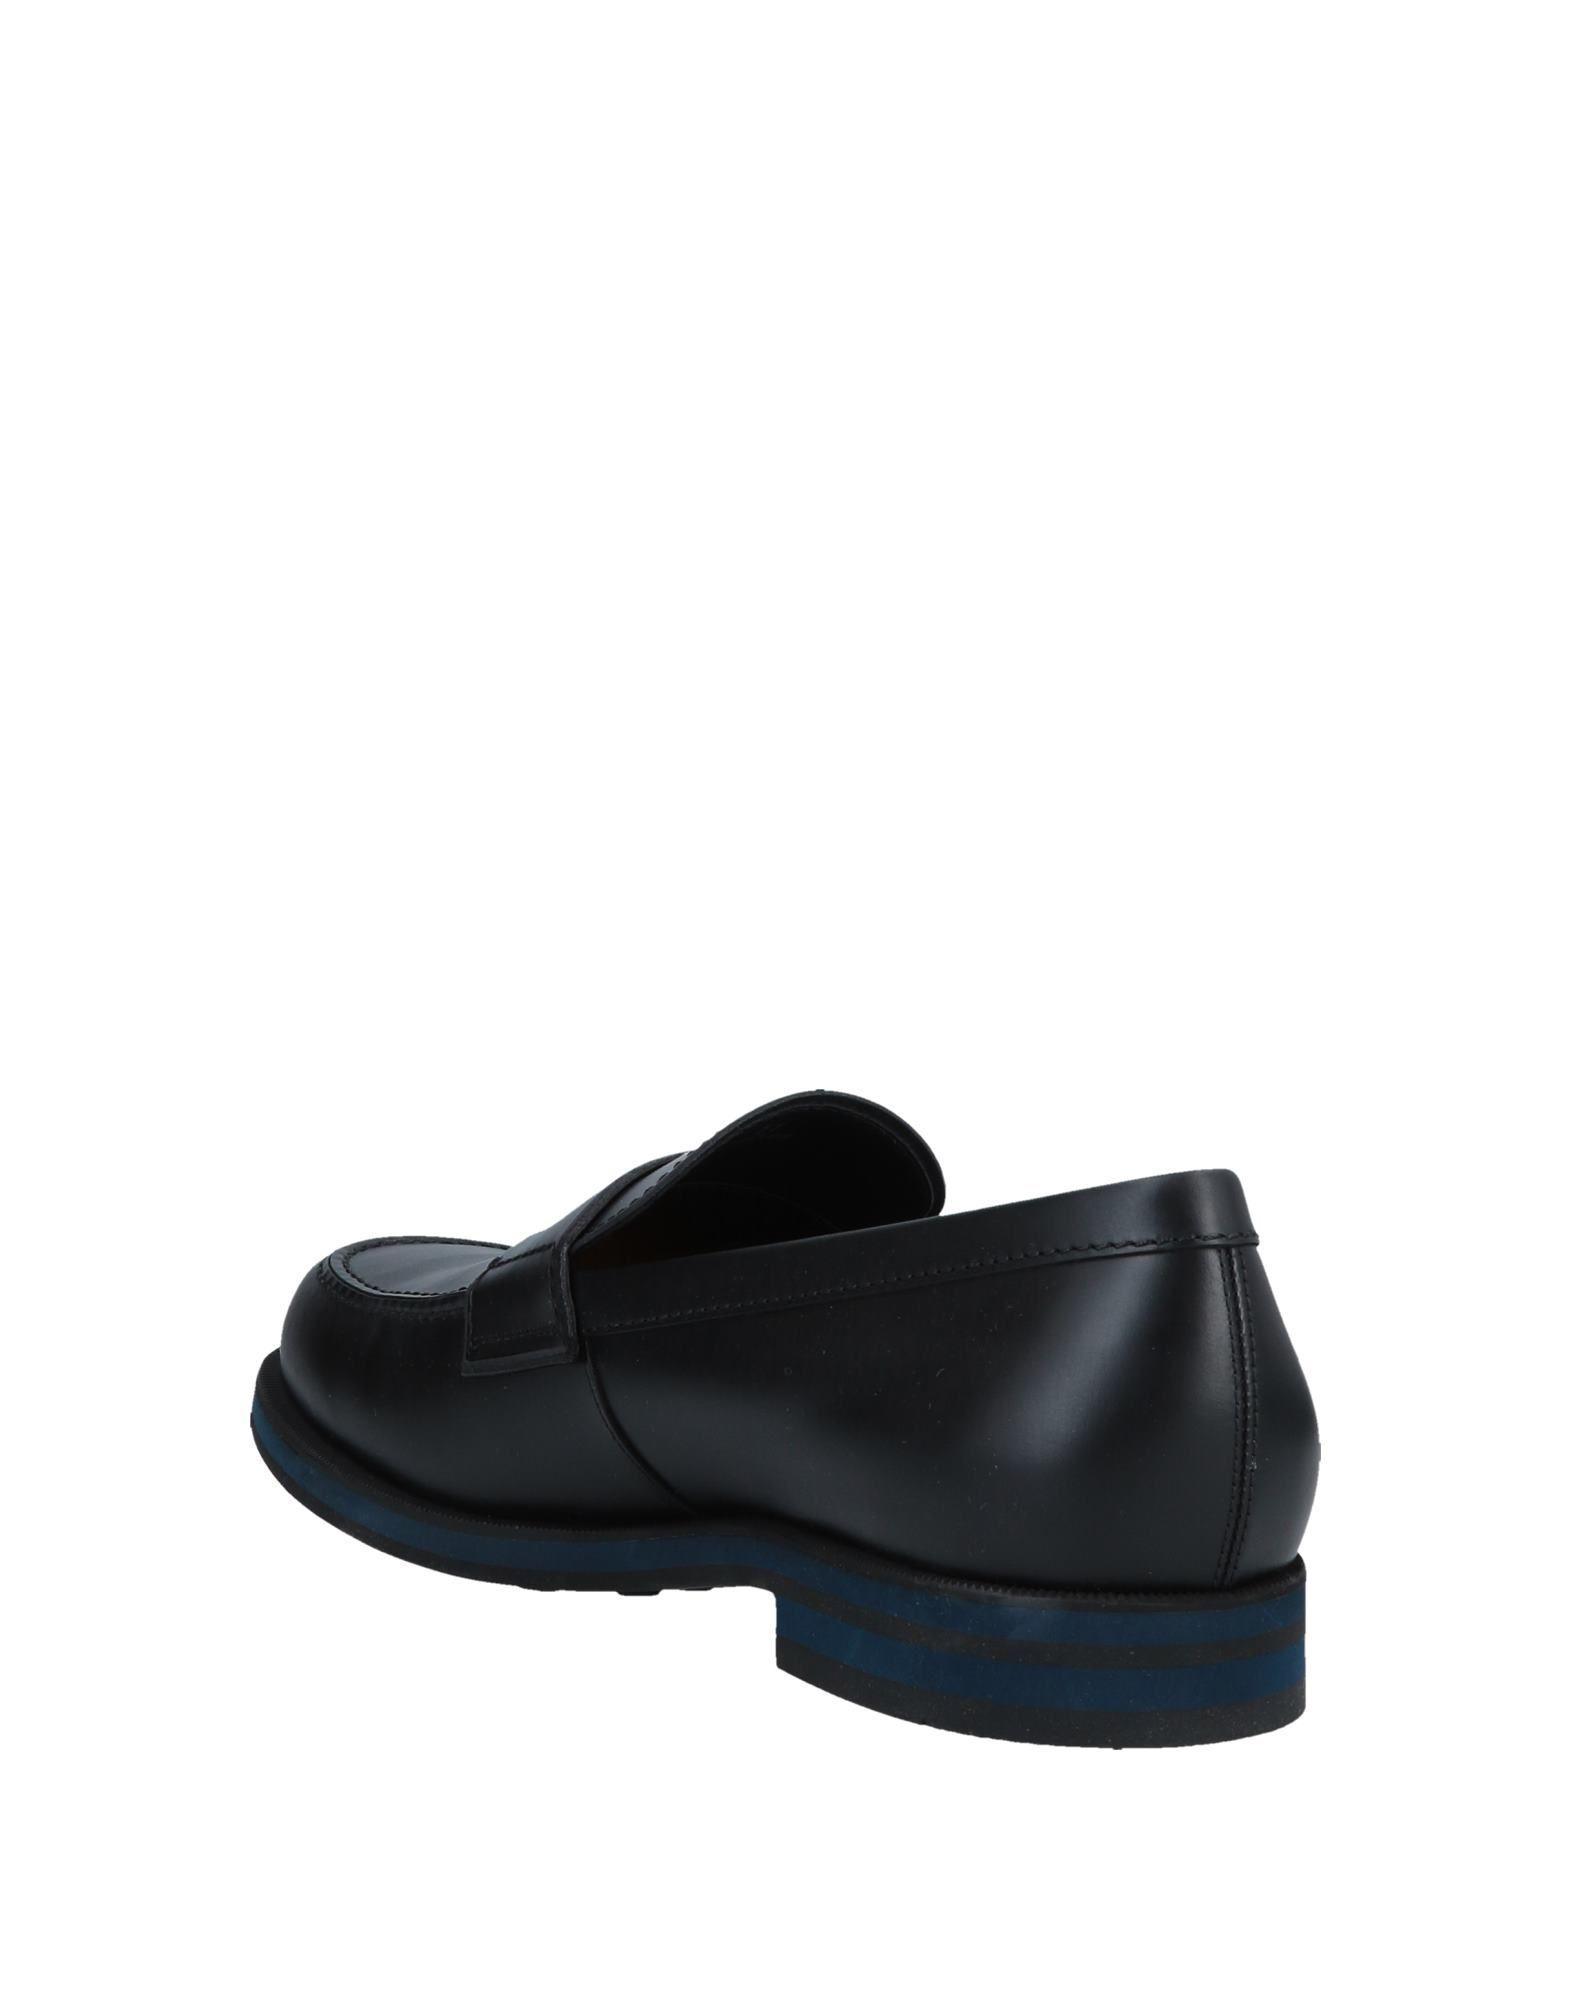 1630381501b Lyst - Tod S Loafer in Black for Men